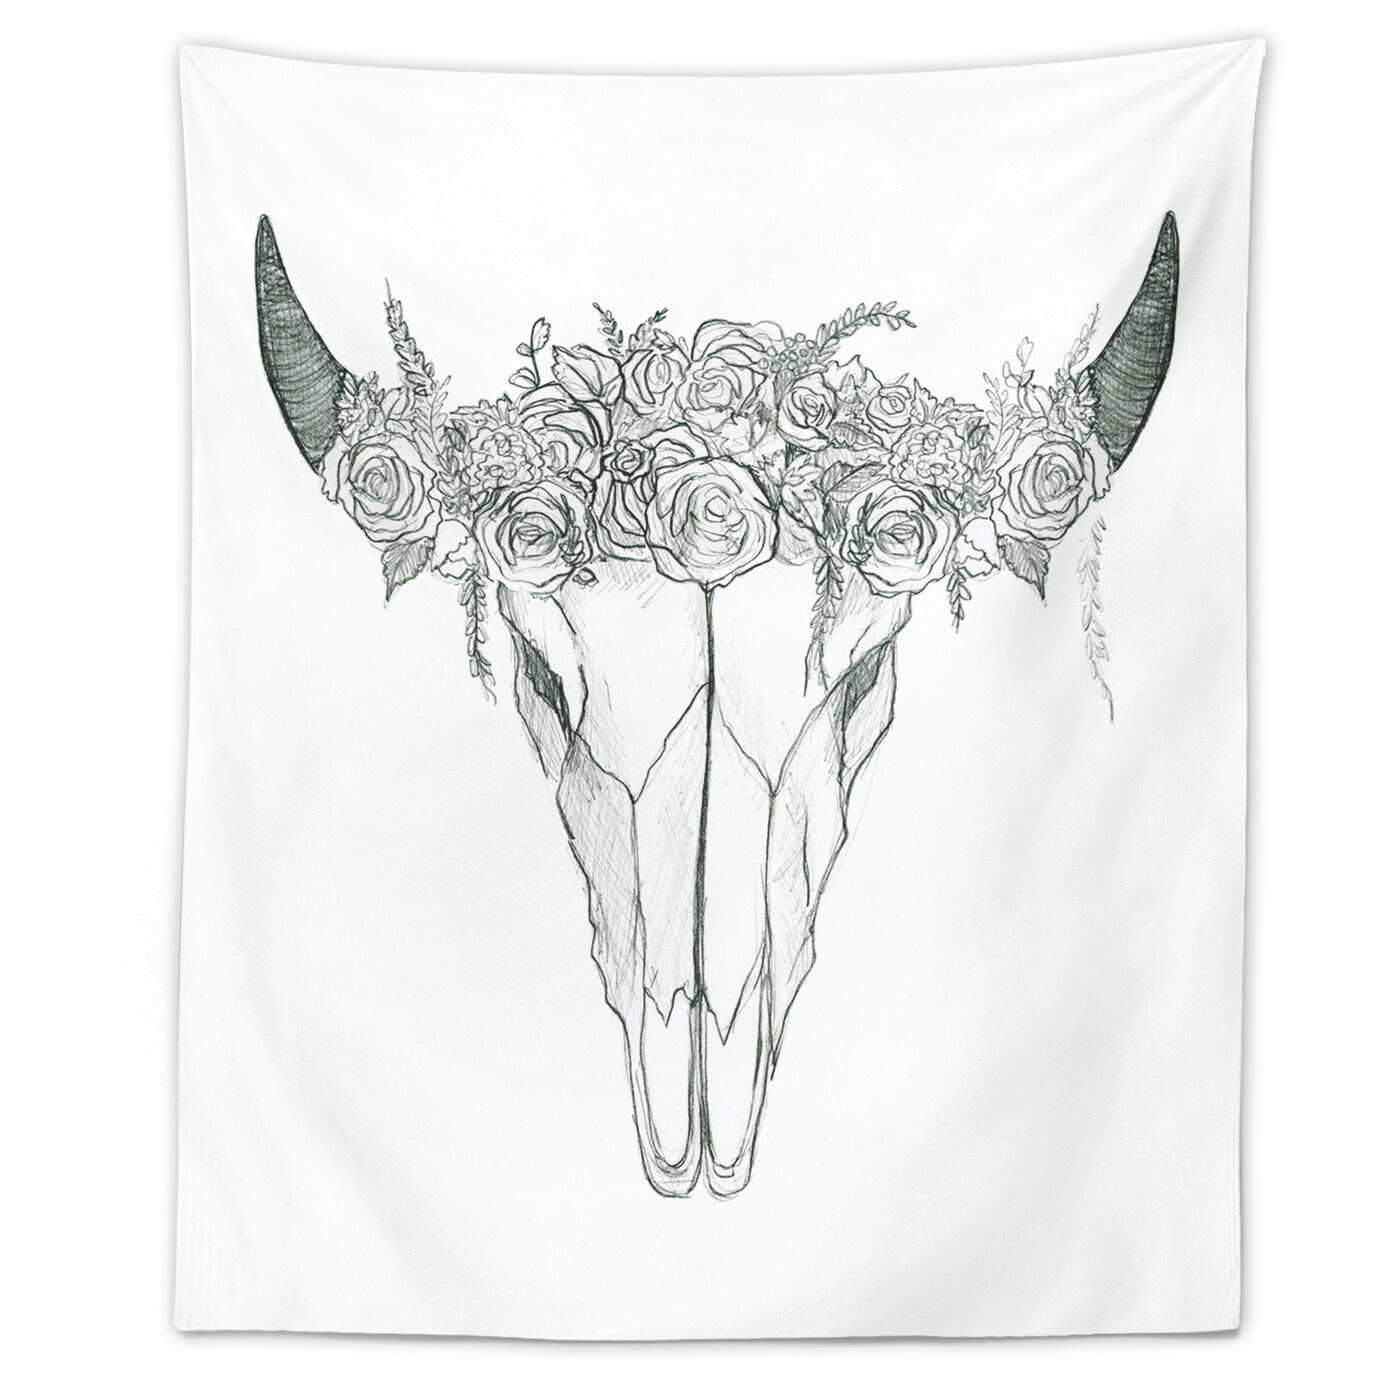 Sketchy Floral Skull Tapestry Art